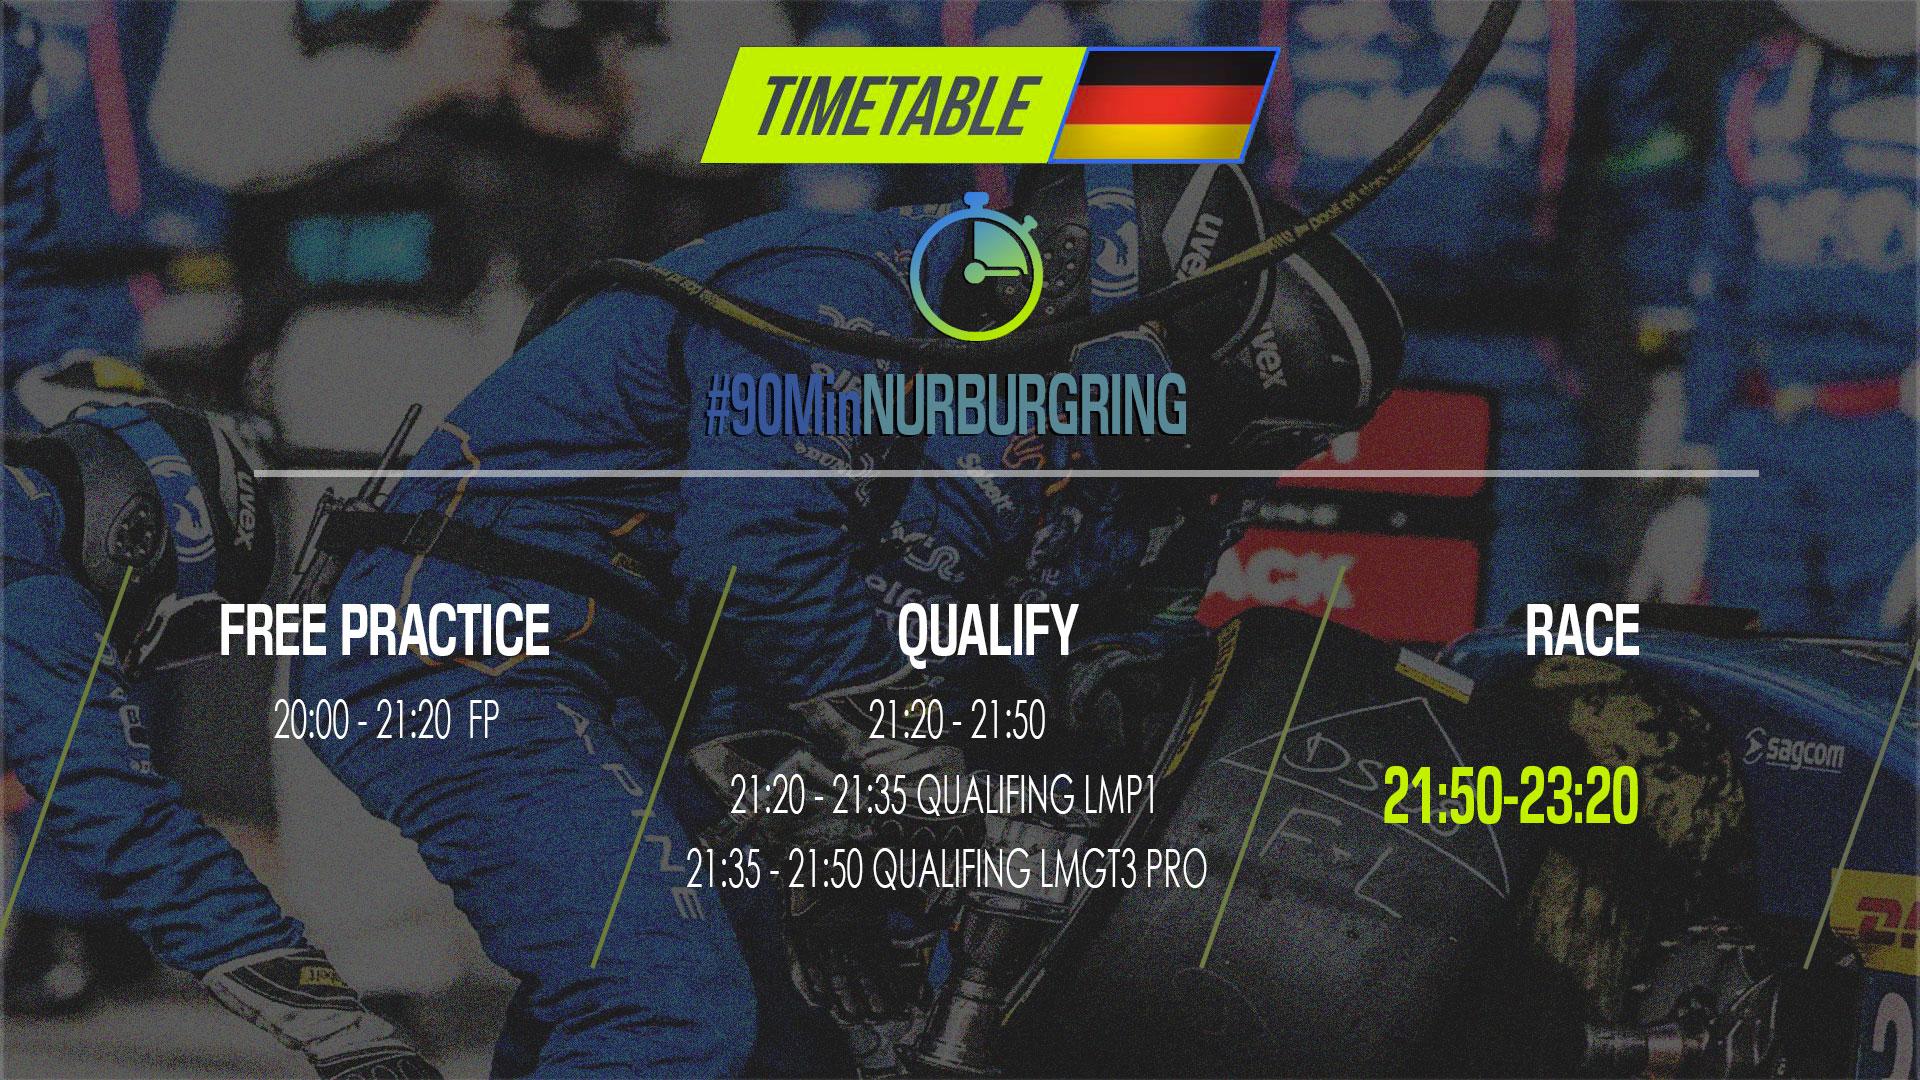 Timetable_Nurburgring.jpg